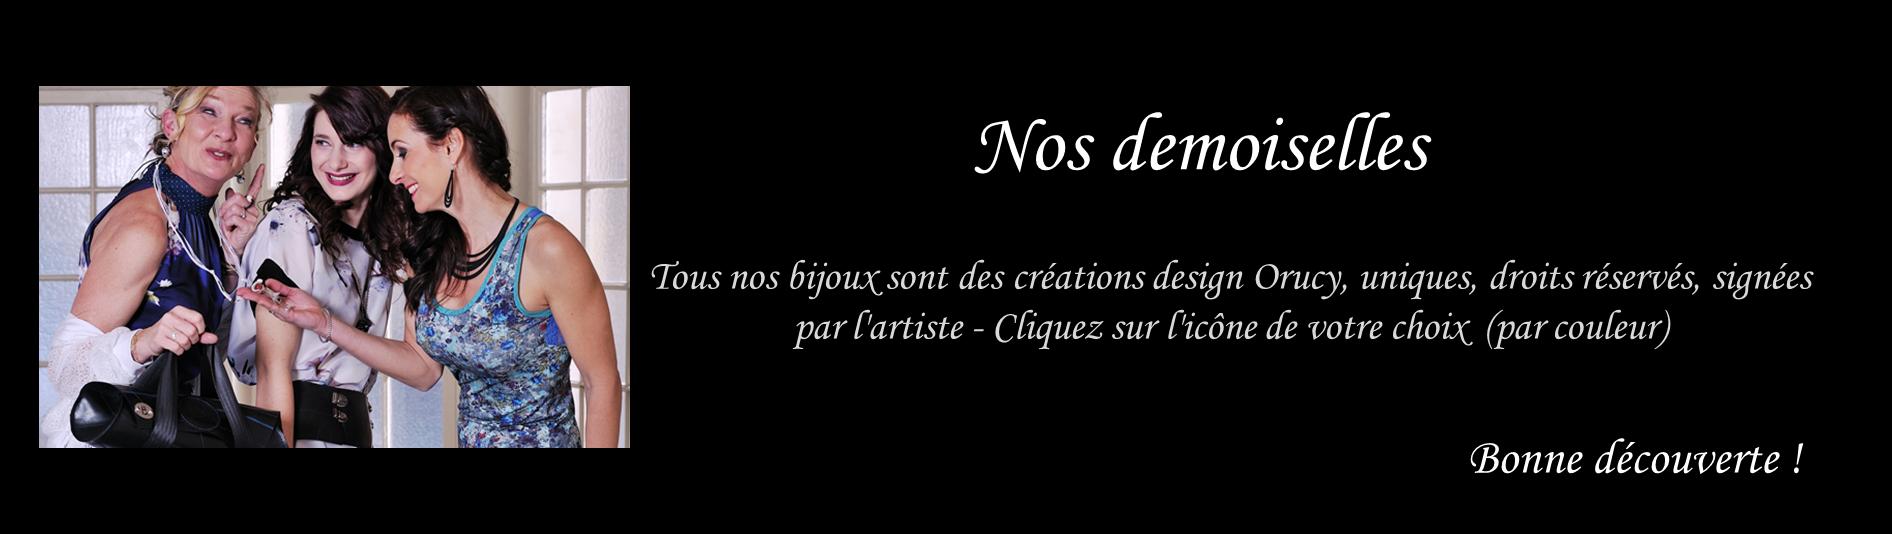 Demoiselles 1